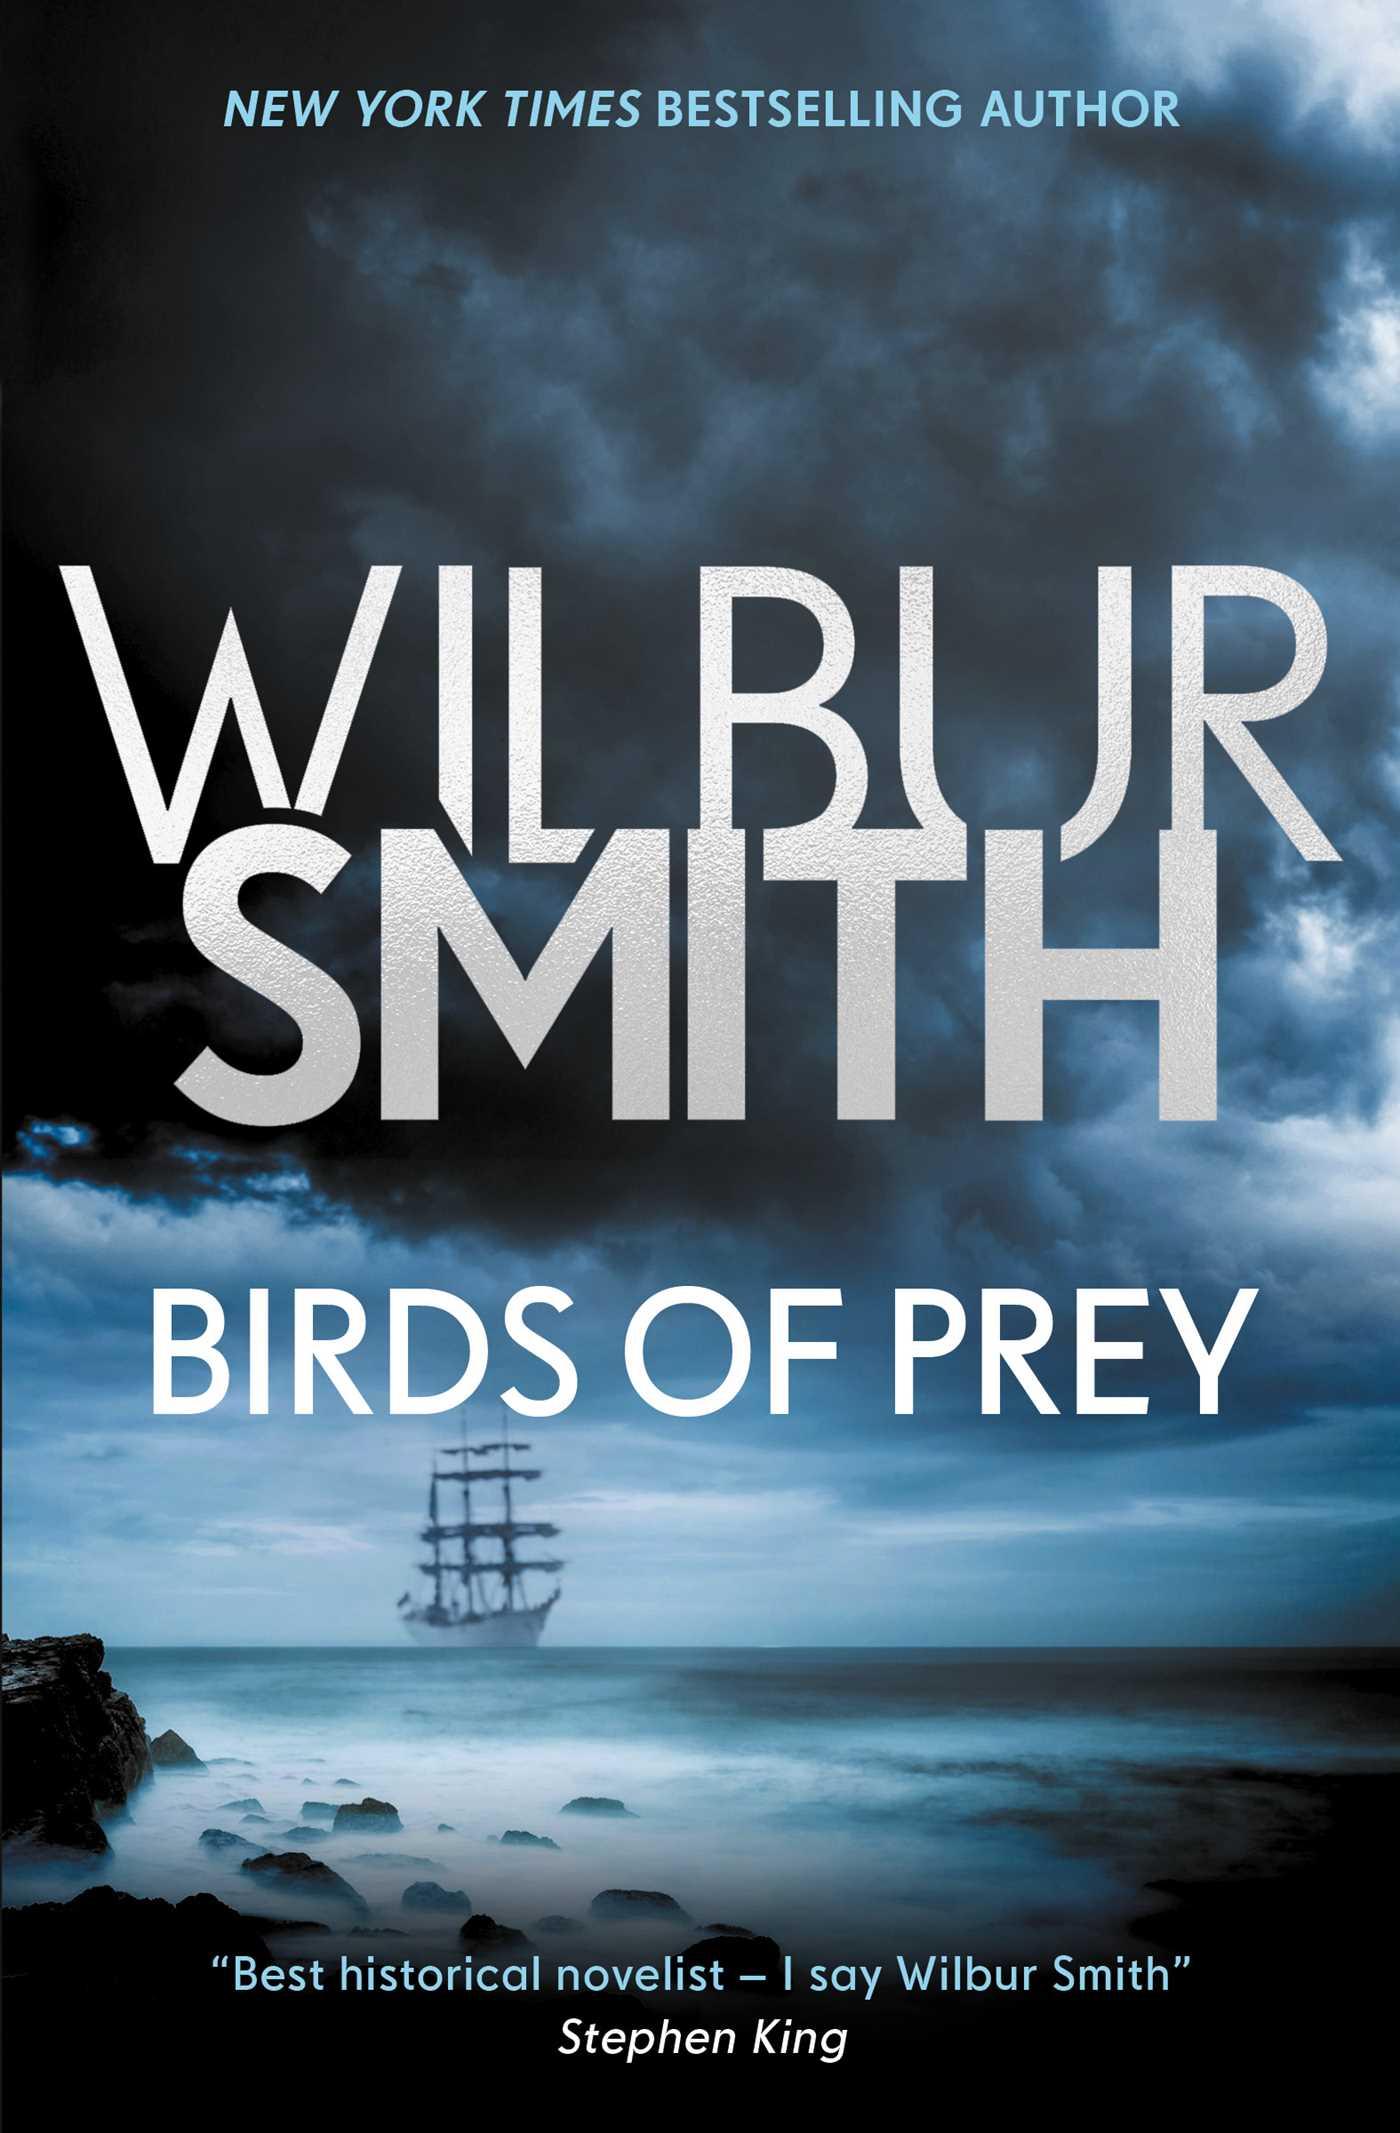 Birds of prey 9781499860917 hr